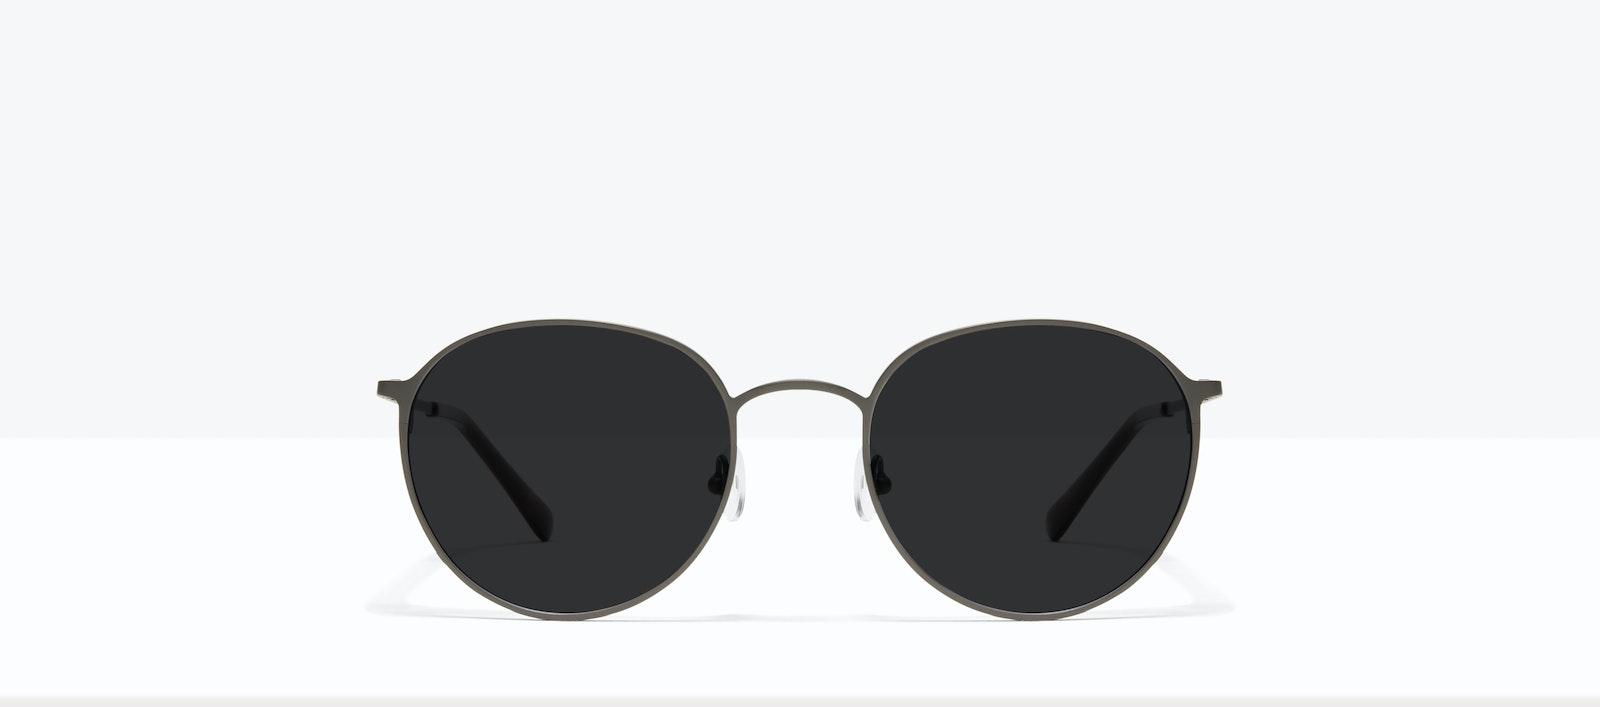 Affordable Fashion Glasses Round Sunglasses Men Ridge Carbon Front